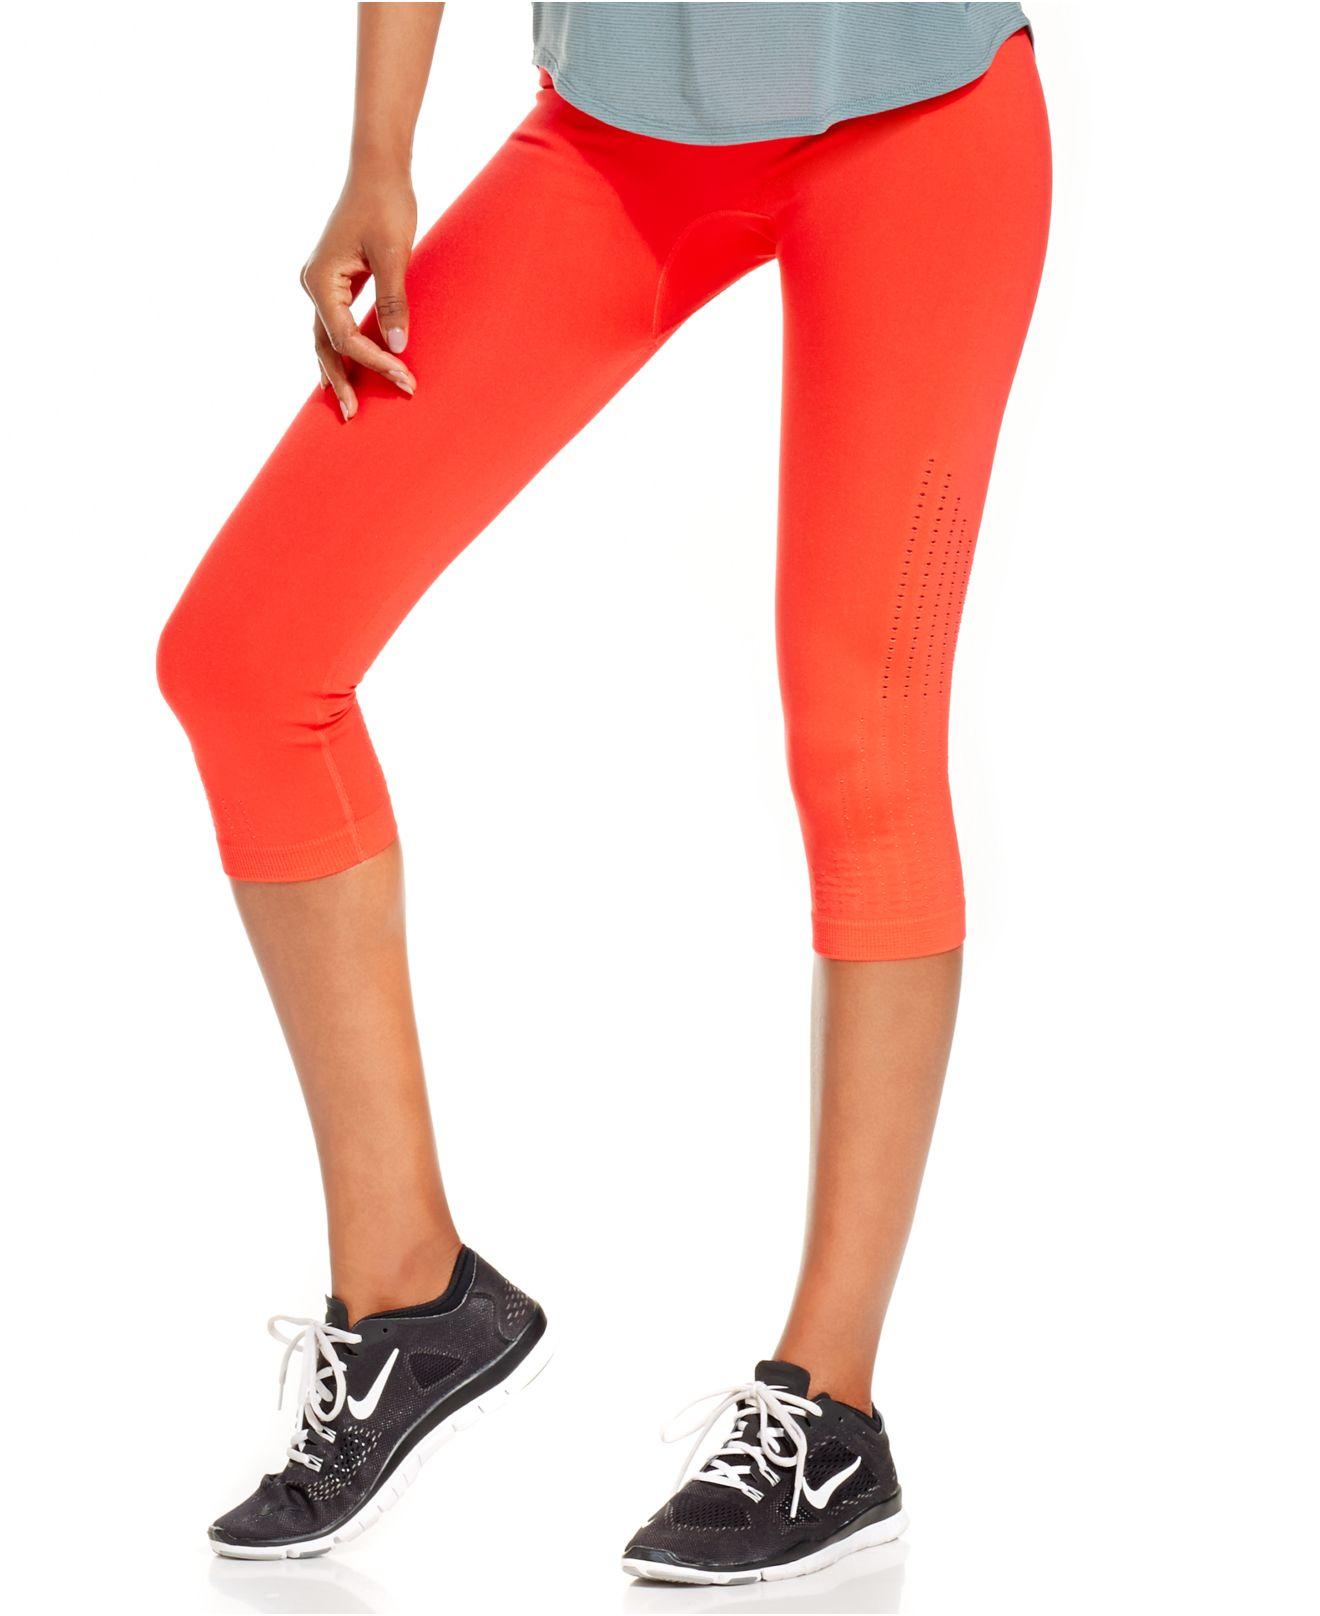 Leggings In Lyst Pro Nike Limitless Capri Dri Orange Fit q0Yx1wq